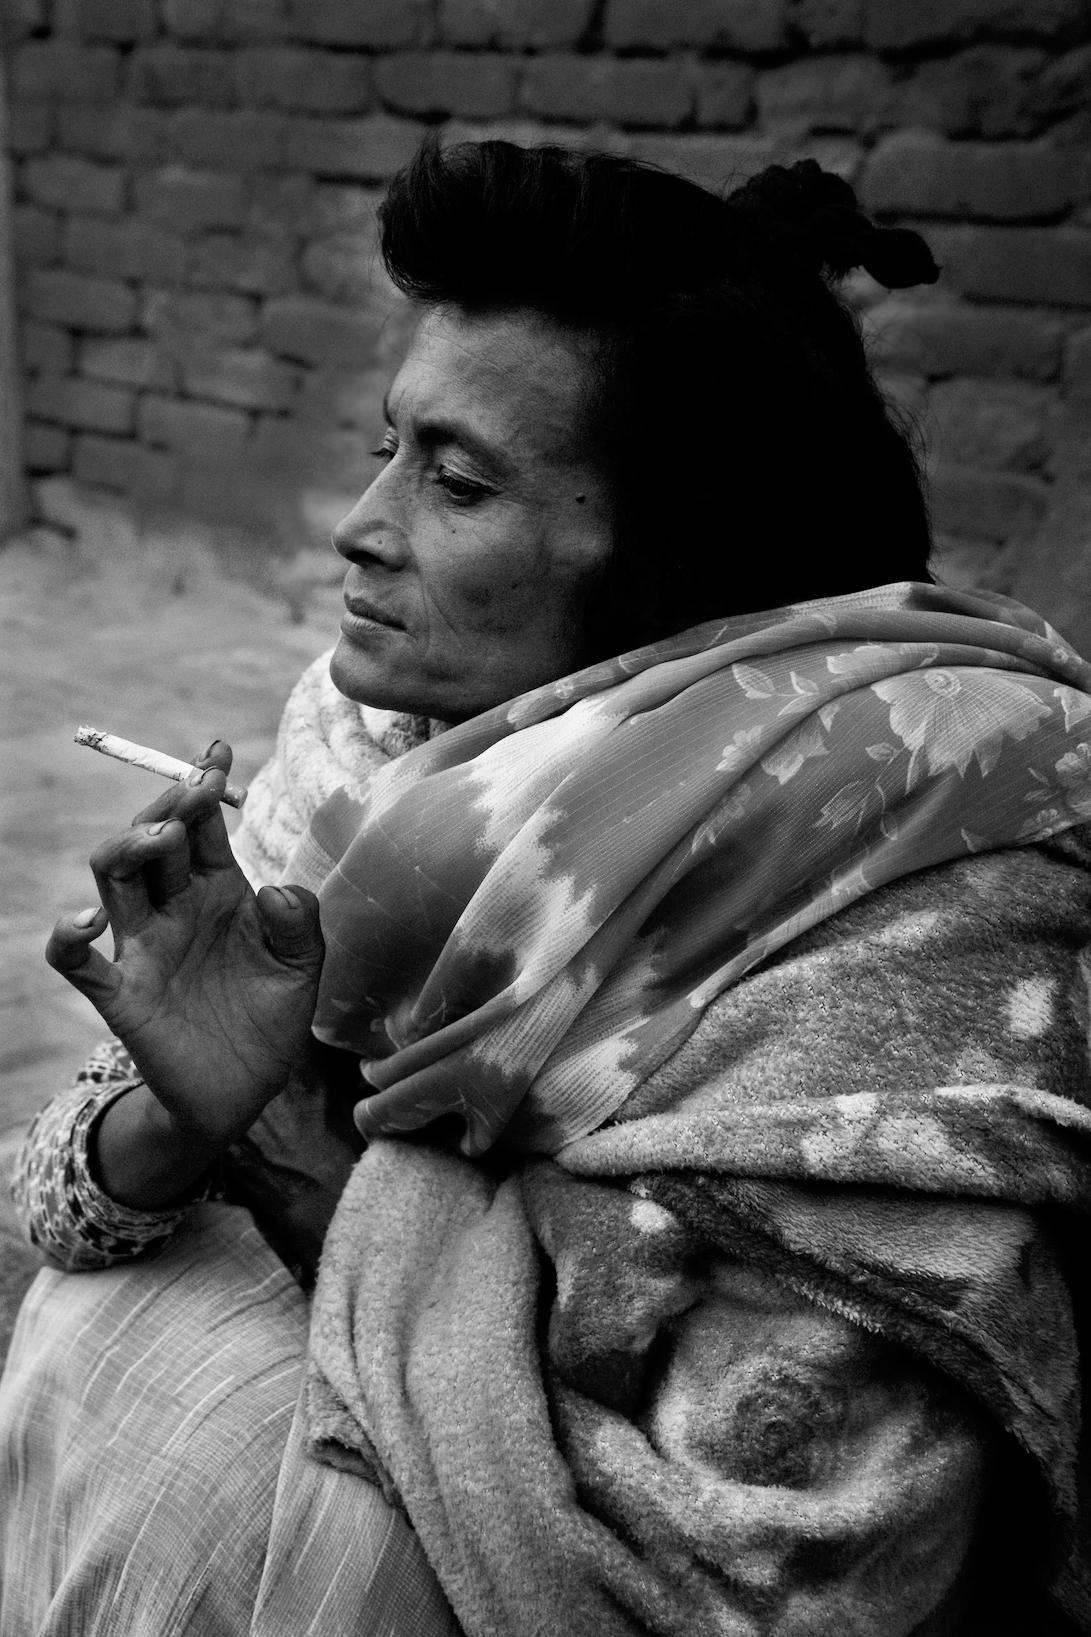 Woman Smoking A Ciggerette